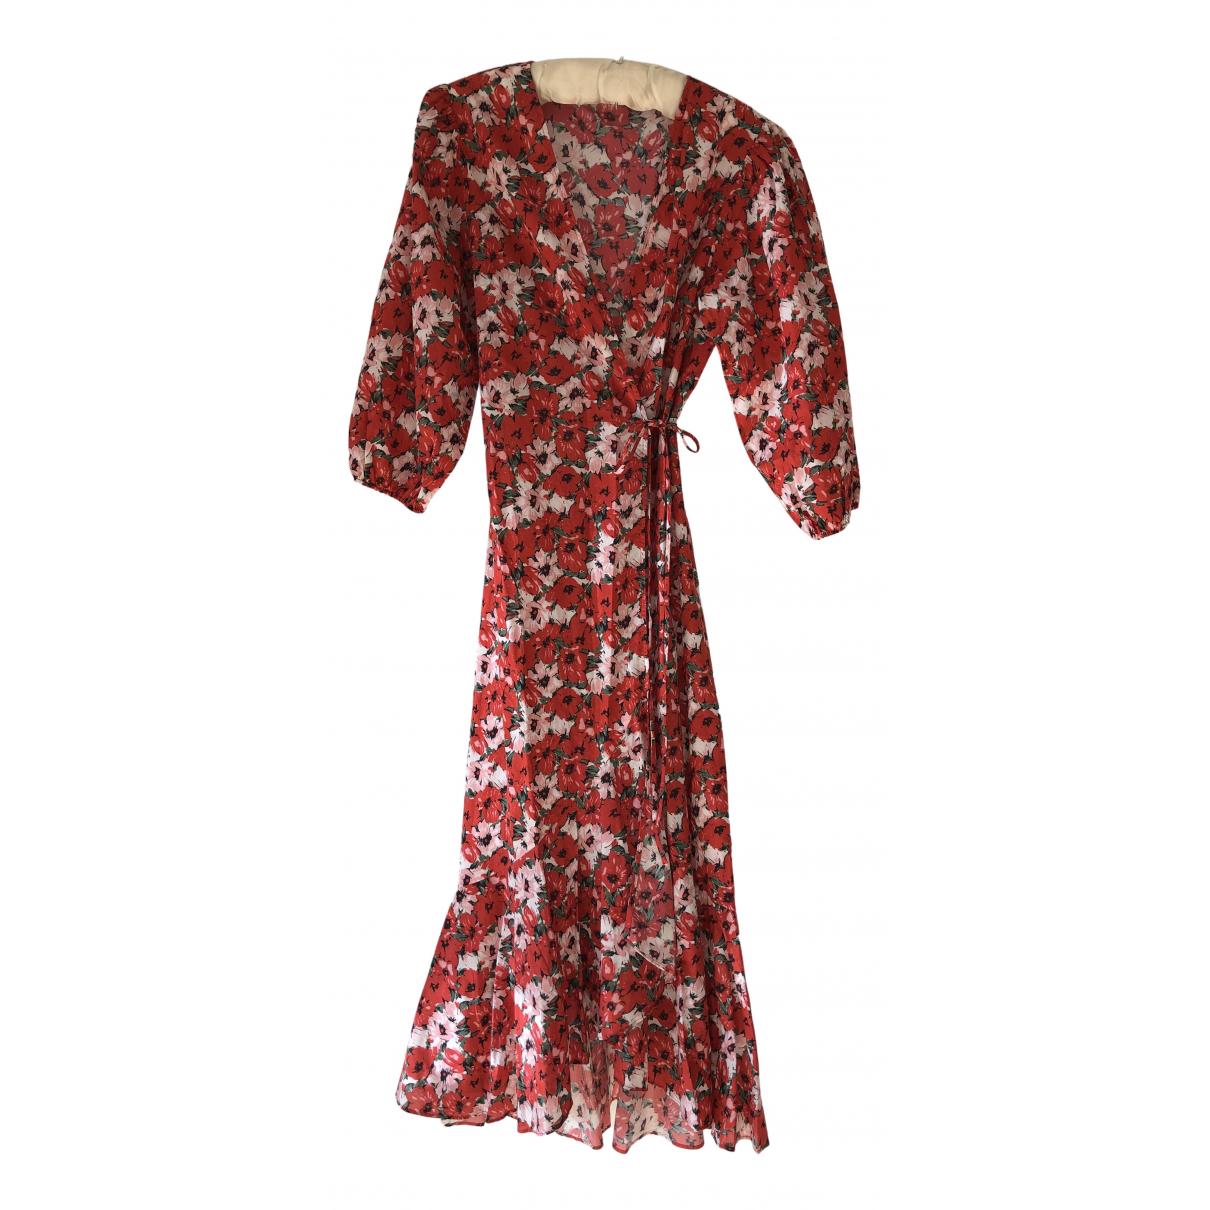 Rixo \N Kleid in  Rot Baumwolle